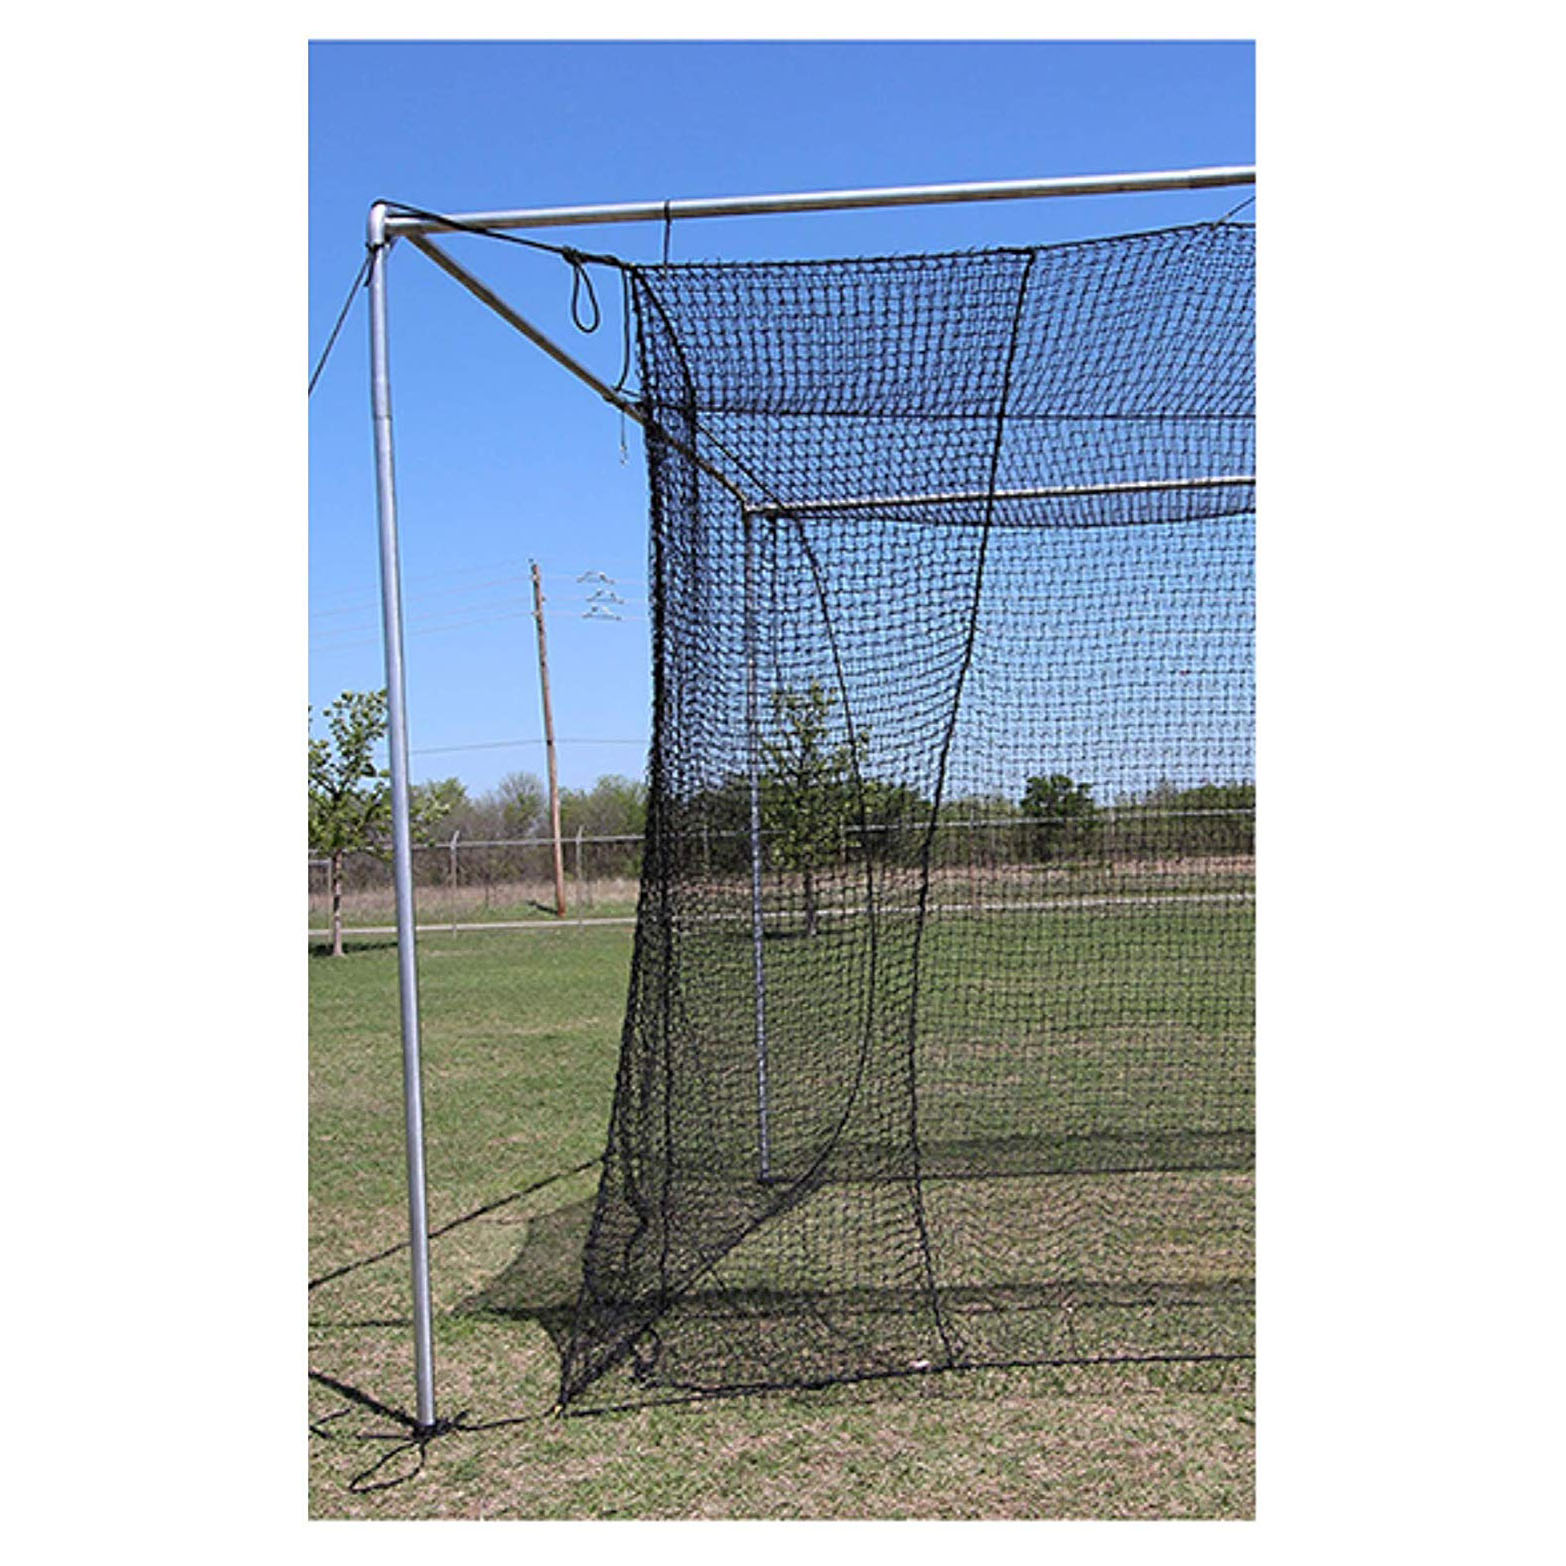 Cimarron Sports Outdoor Twisted Baseball Batting Cage Net ...